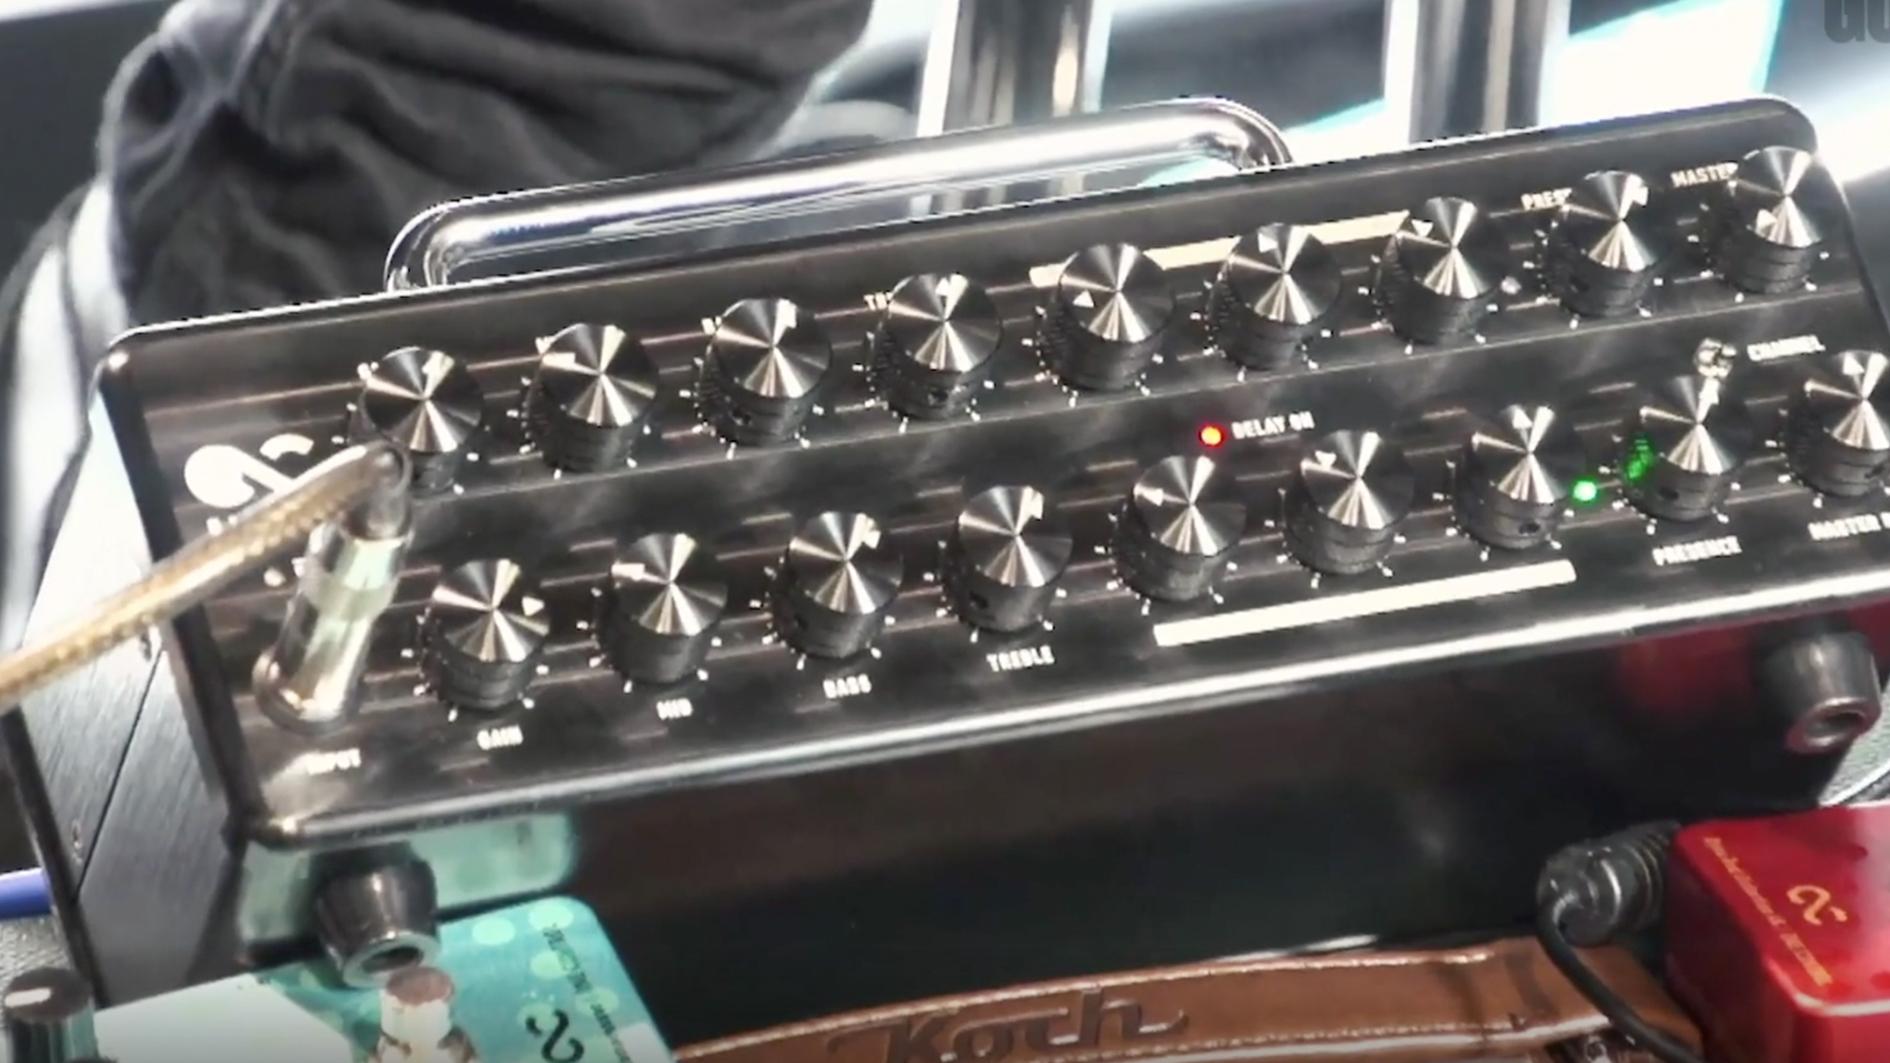 GW live at NAMM 2020: Watch Professor Tomo Fujita demo the new One Control BJF-S100 amp head